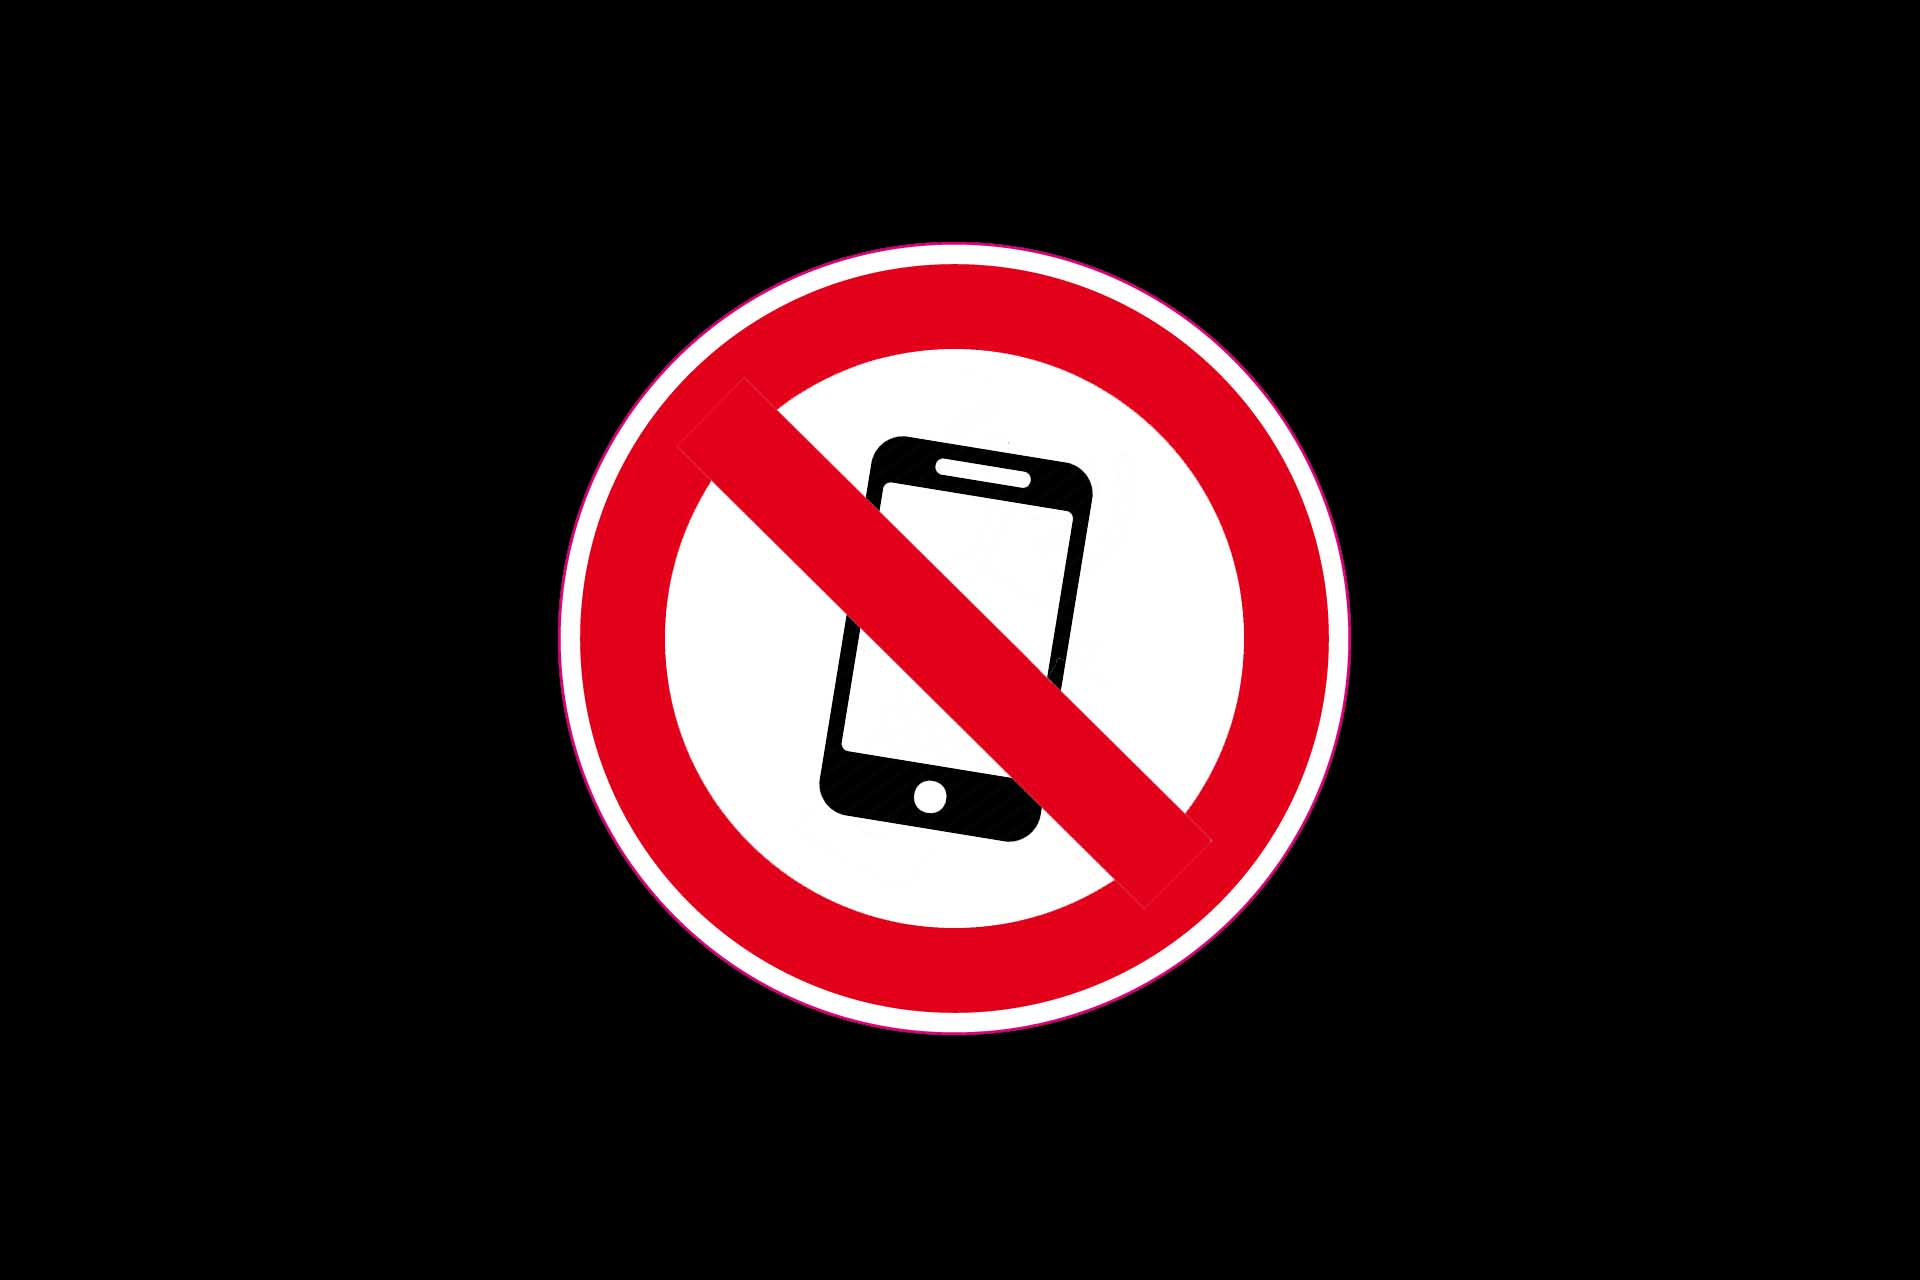 t2informatik Blog: Mobile-free zone - detox totales